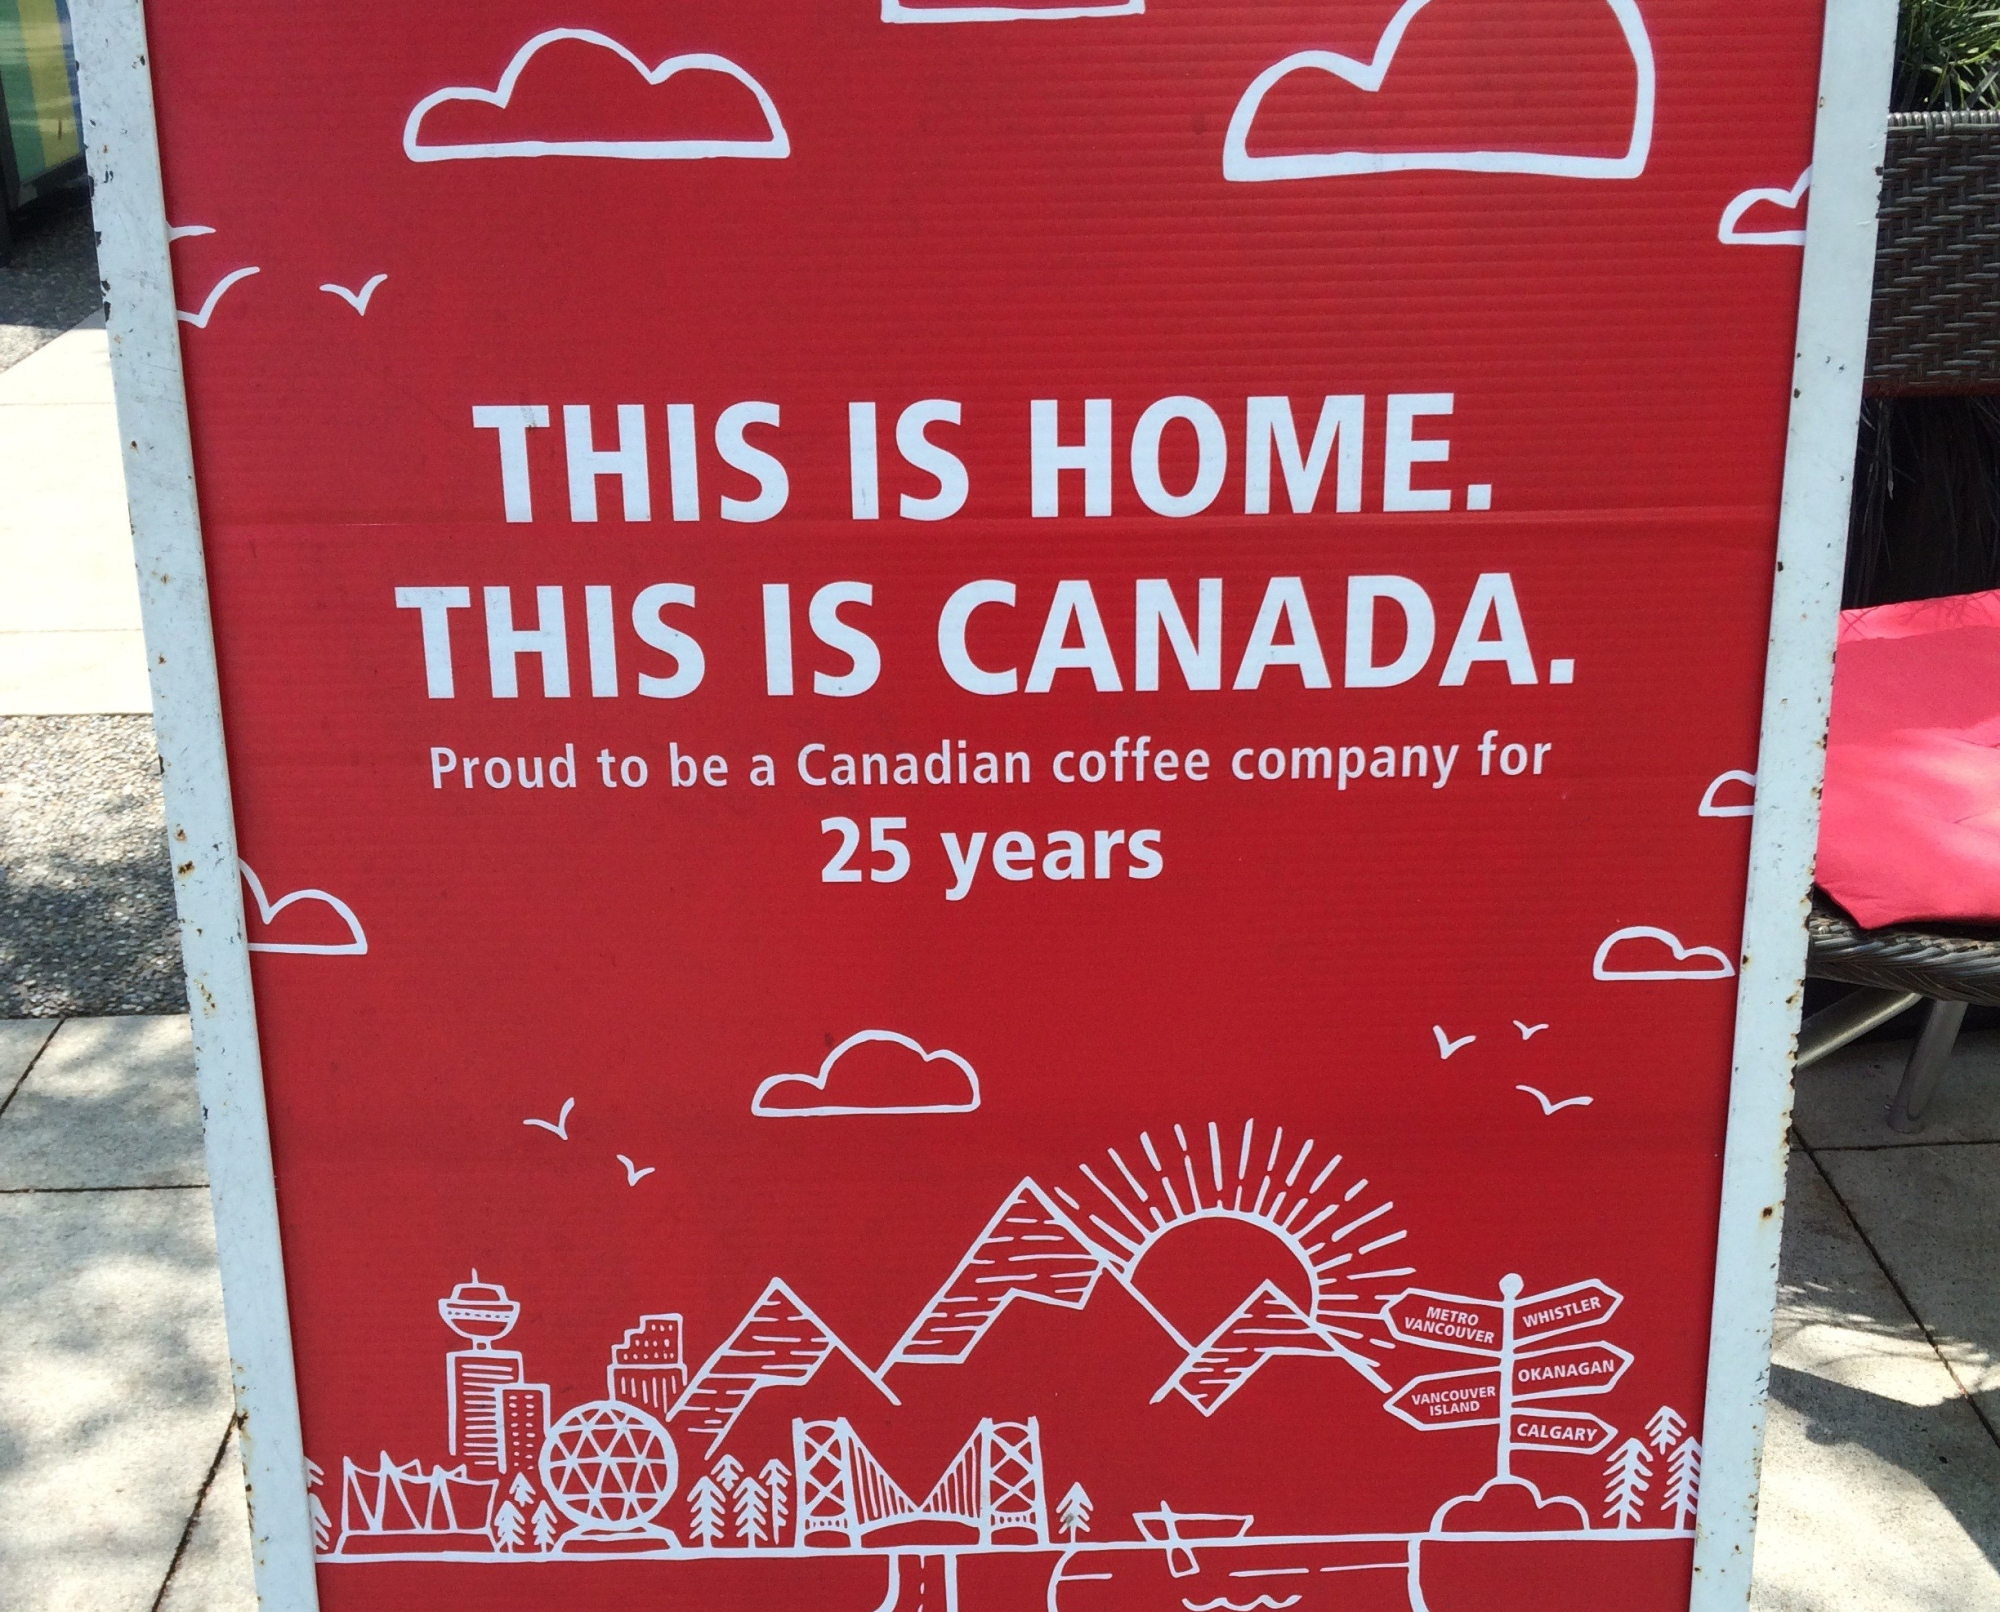 Patriotic Blenz Coffee advertisement in Vancouver